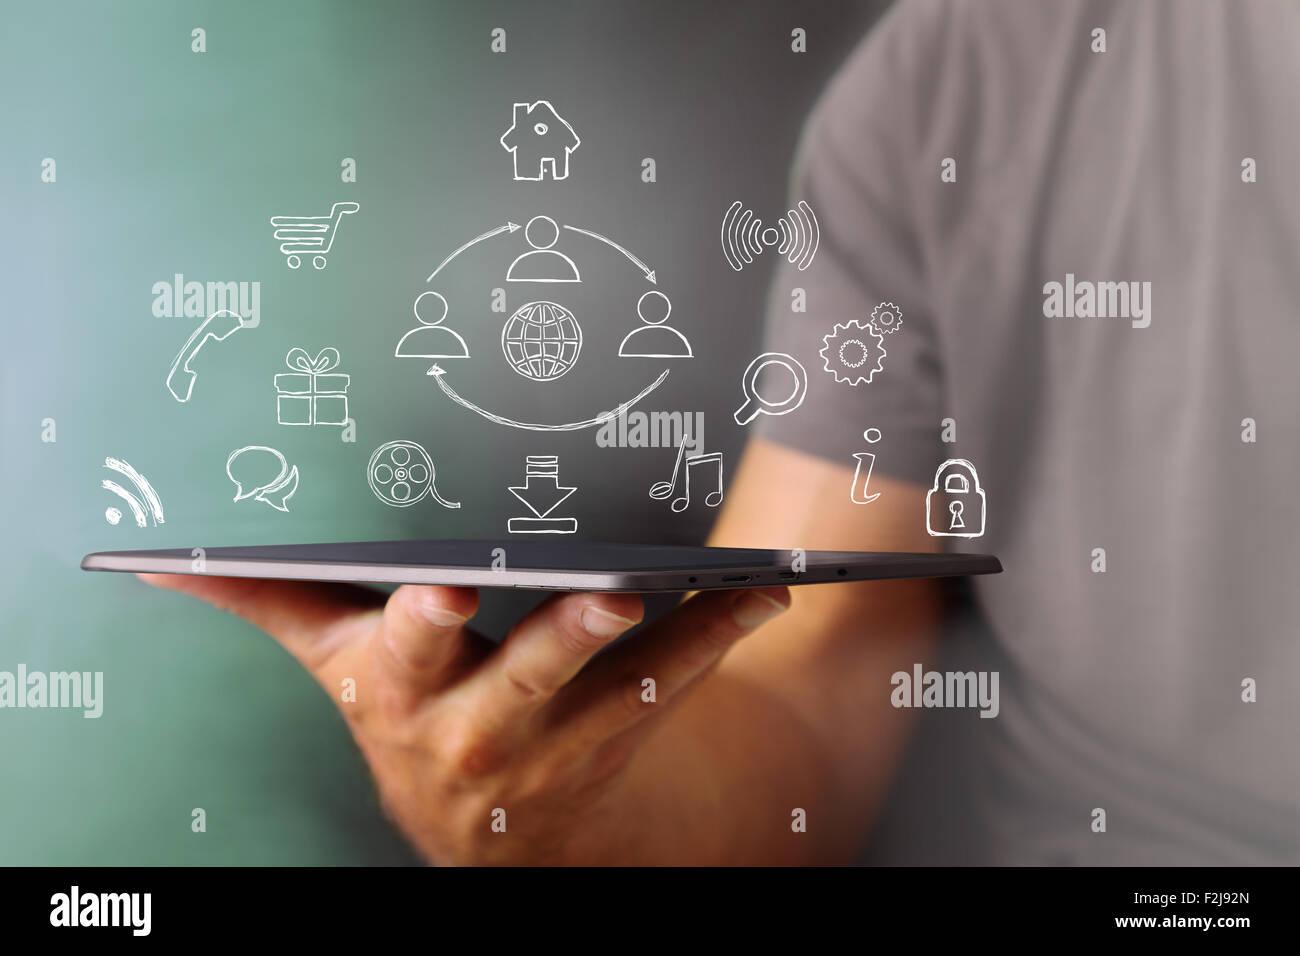 Digital Power - Stock Image